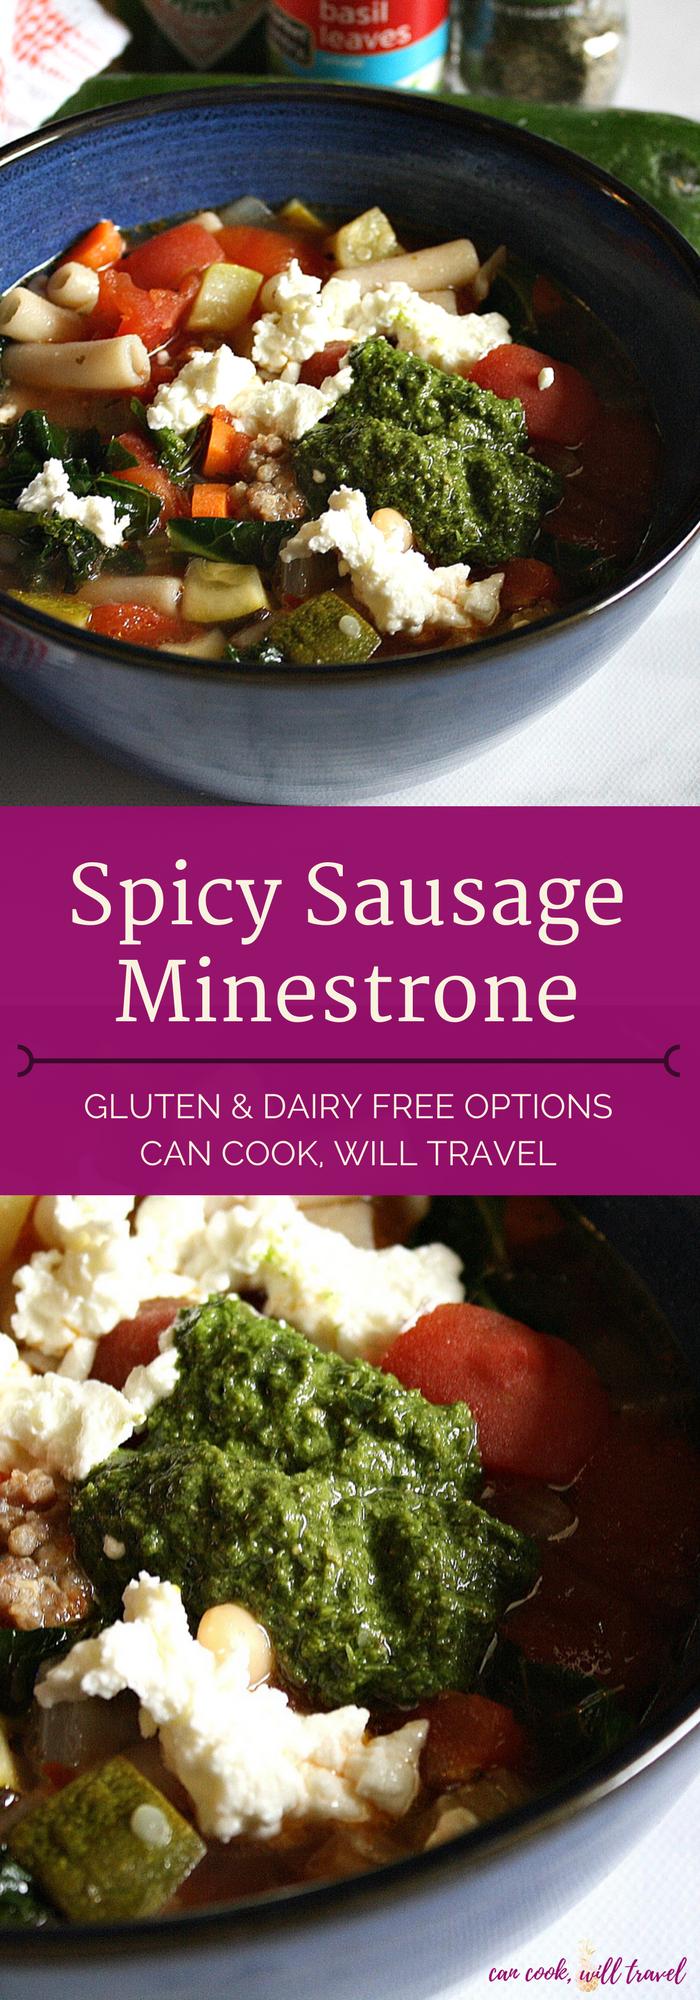 Spicy Sausage Minestrone_Collage1